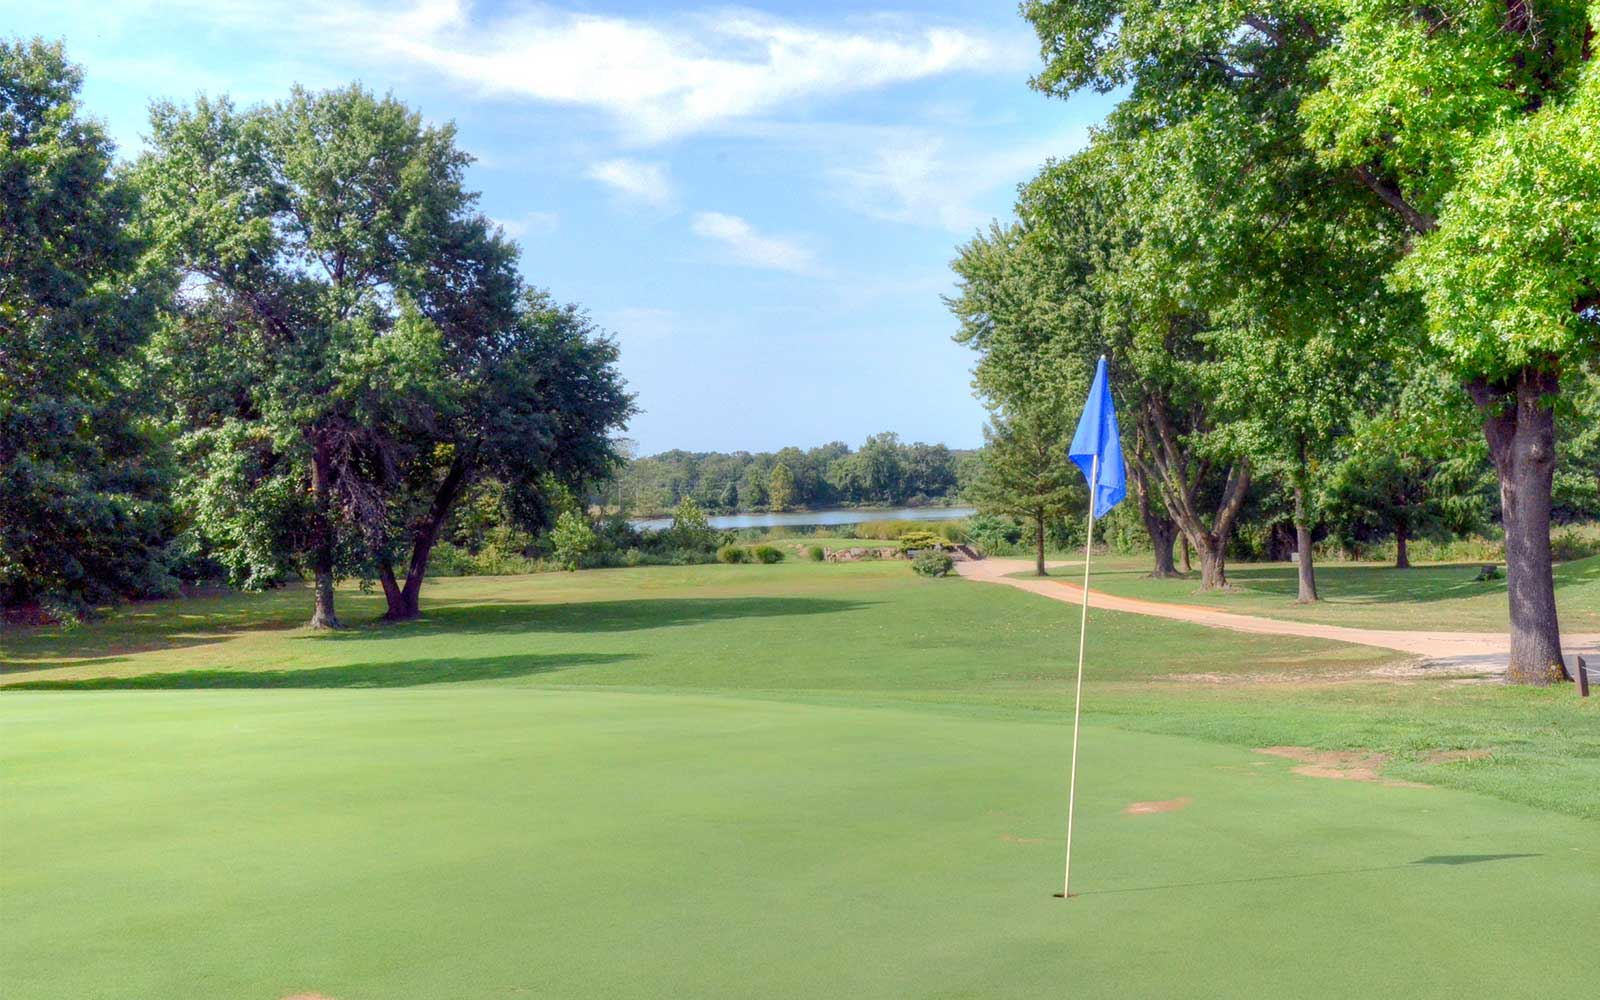 Gene-Pray-Memorial-Golf-Course,-El-Dorado-Springs,-MO-Green